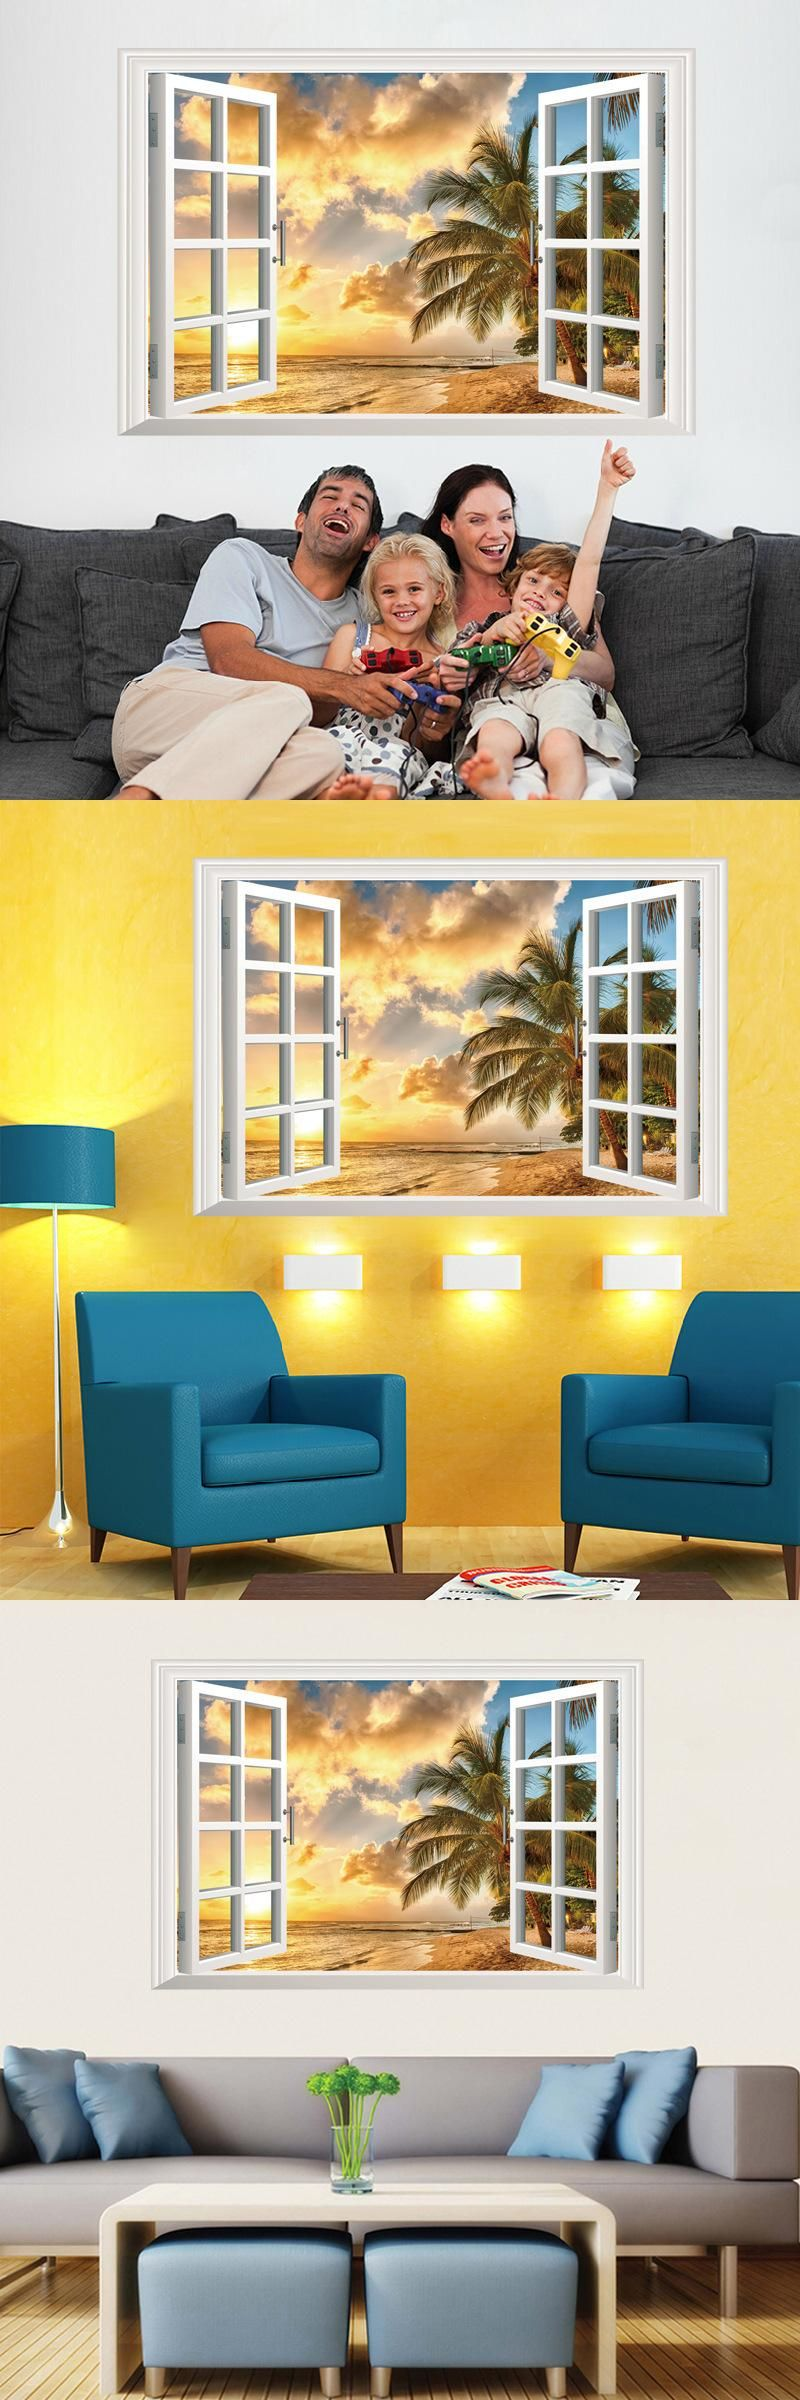 New Arrival 3D Window Scenery Beautiful Sea Beach View Wall Sticker ...